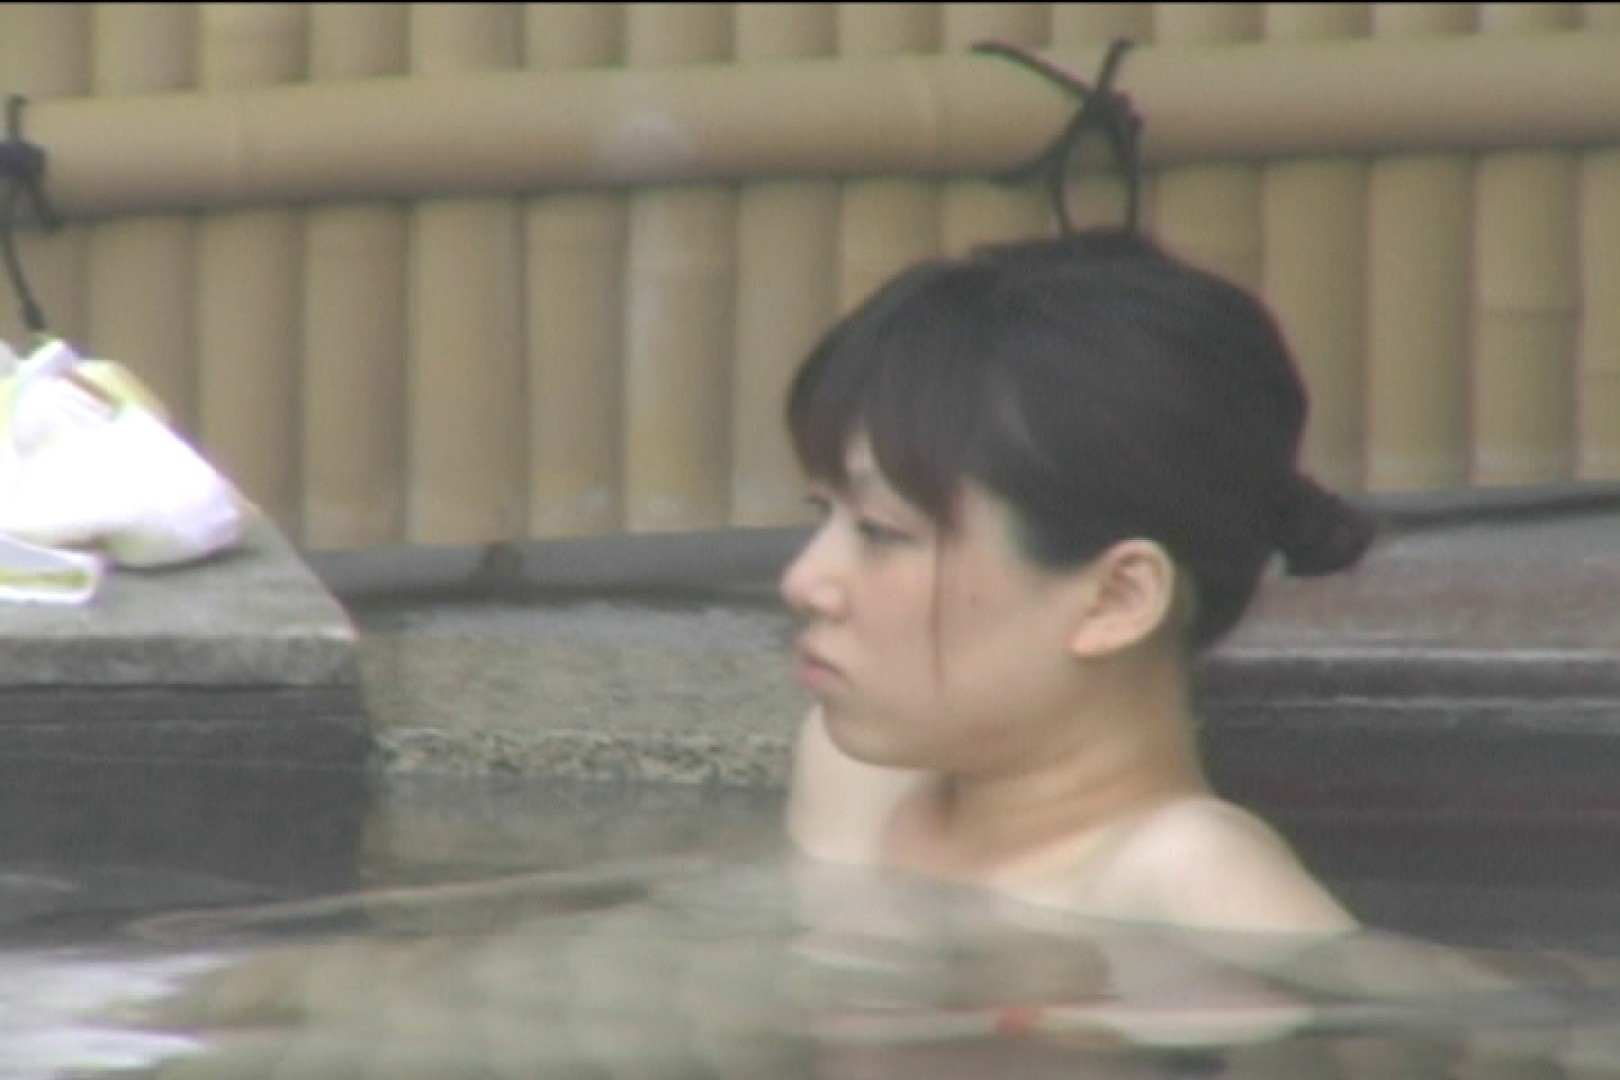 Aquaな露天風呂Vol.121 美しいOLの裸体   露天風呂突入  105pic 40